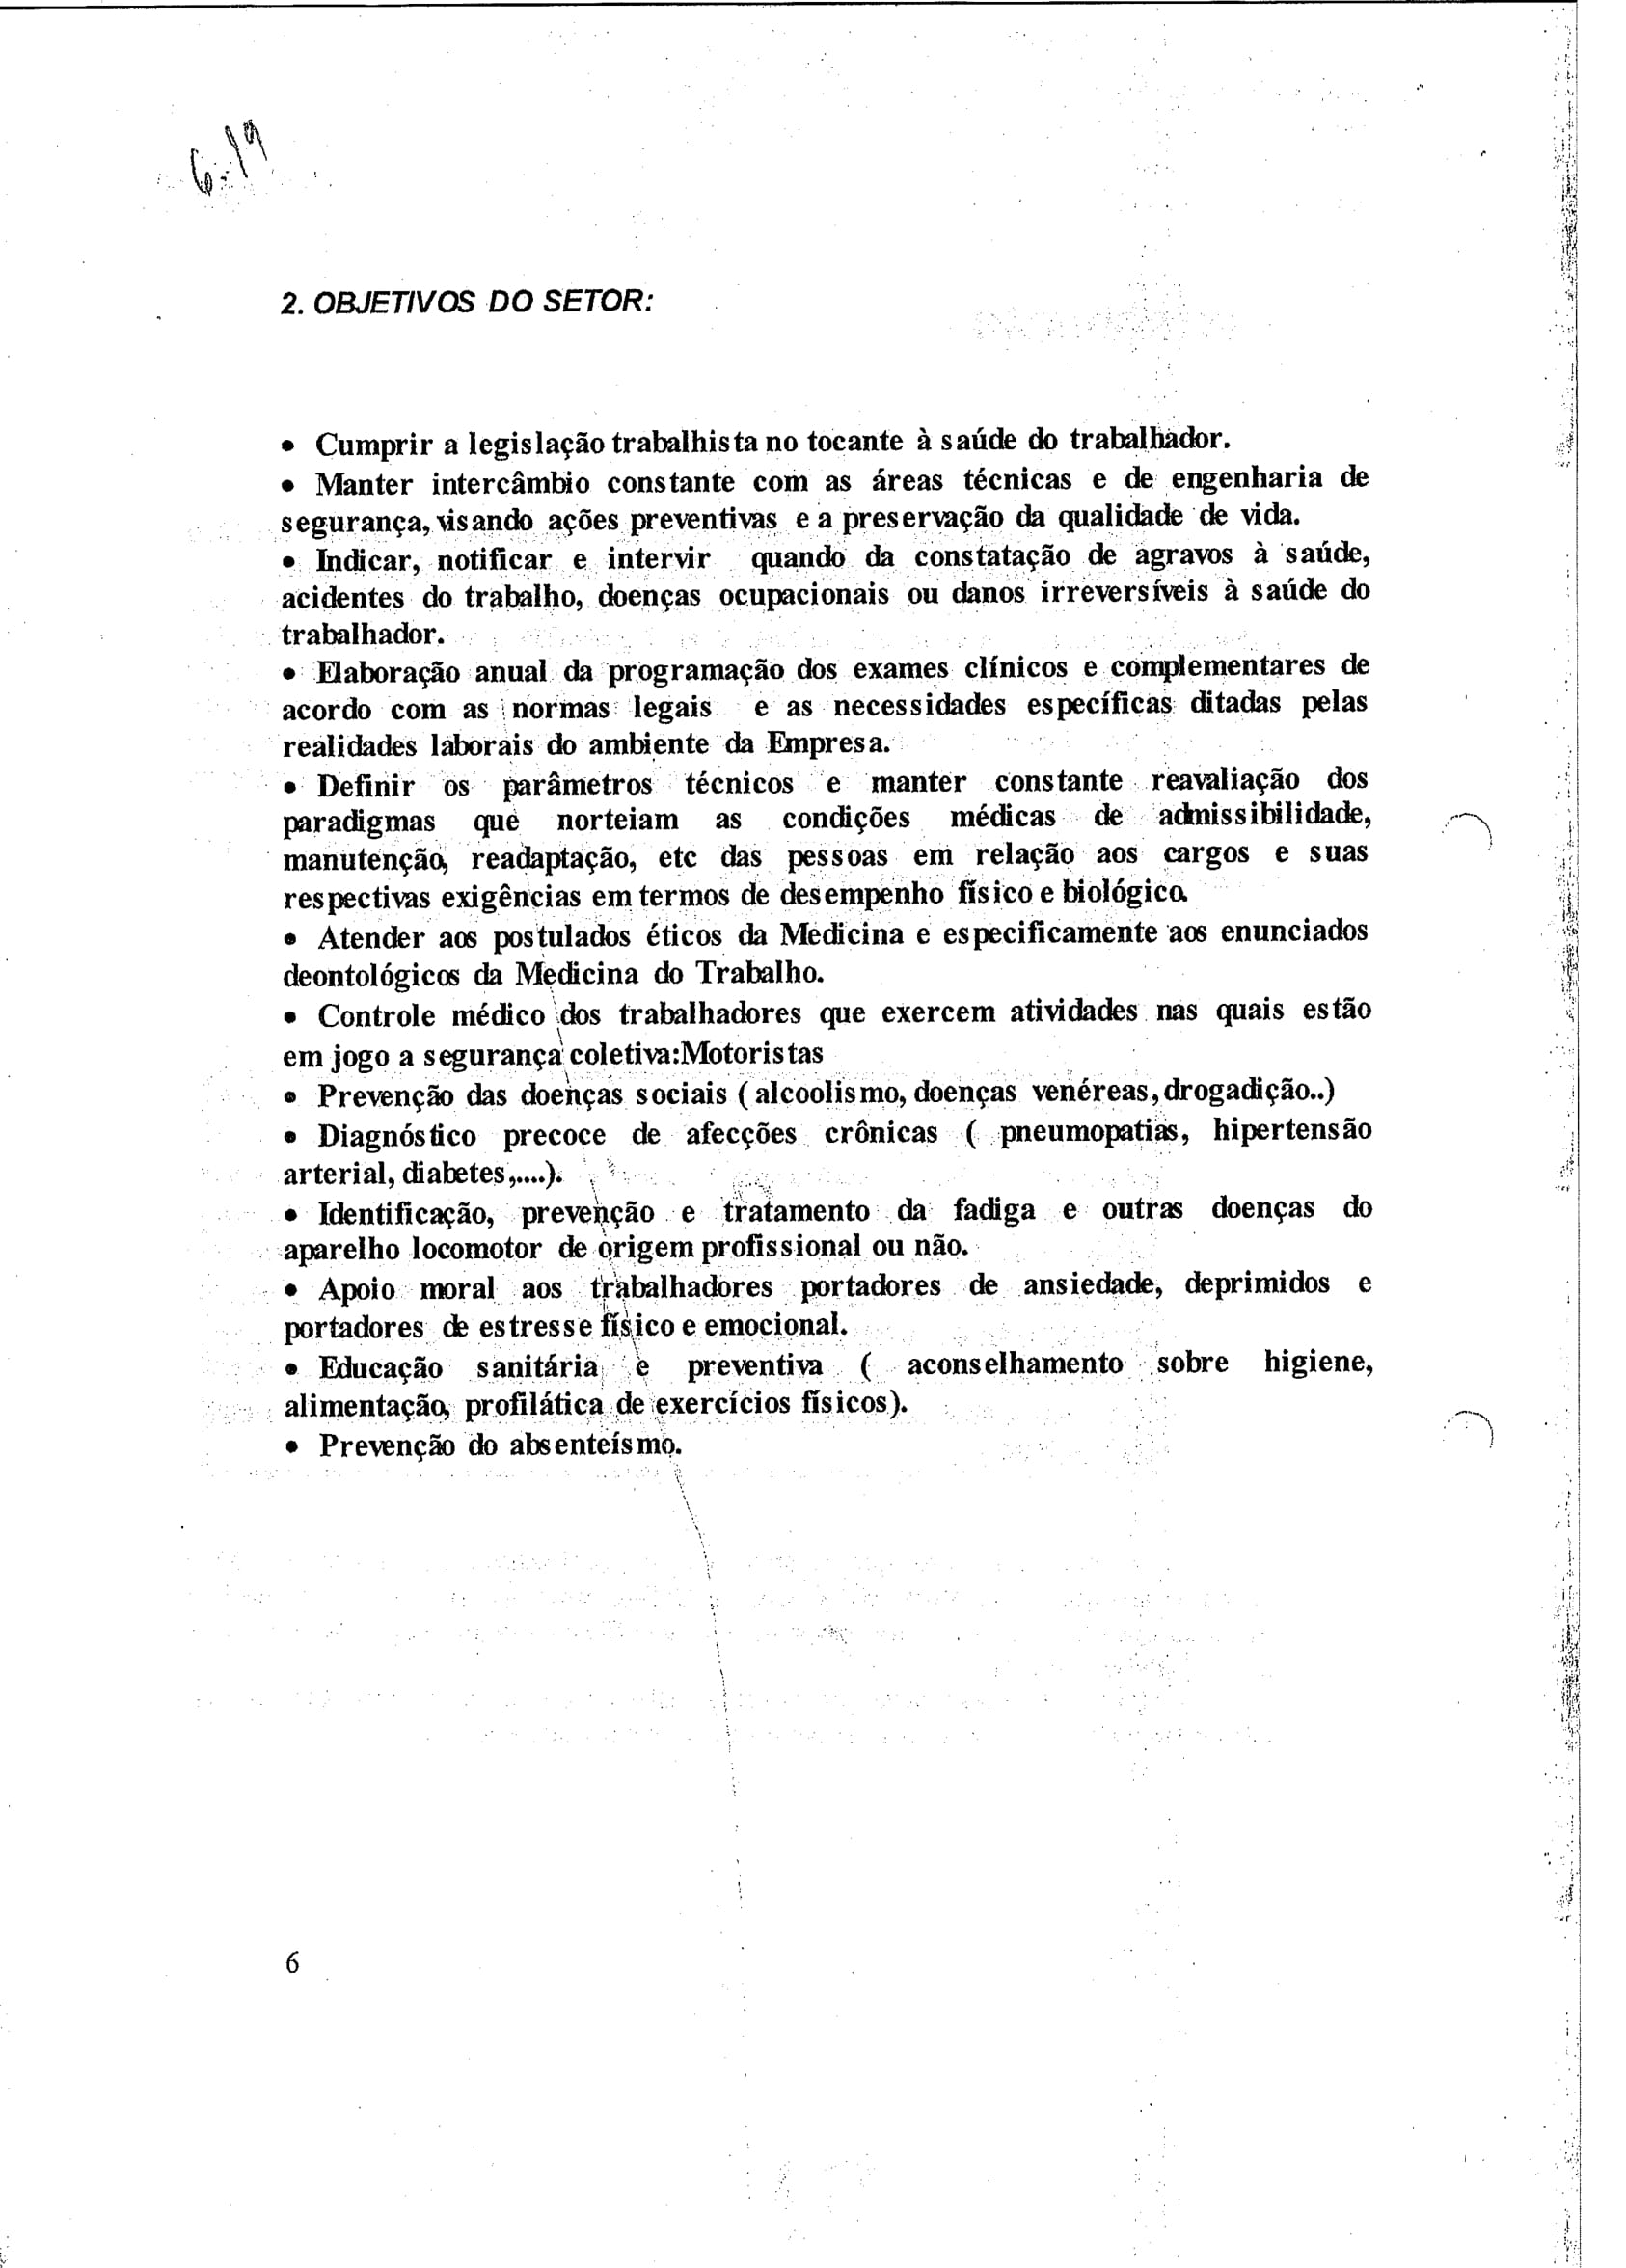 PL001222019-084